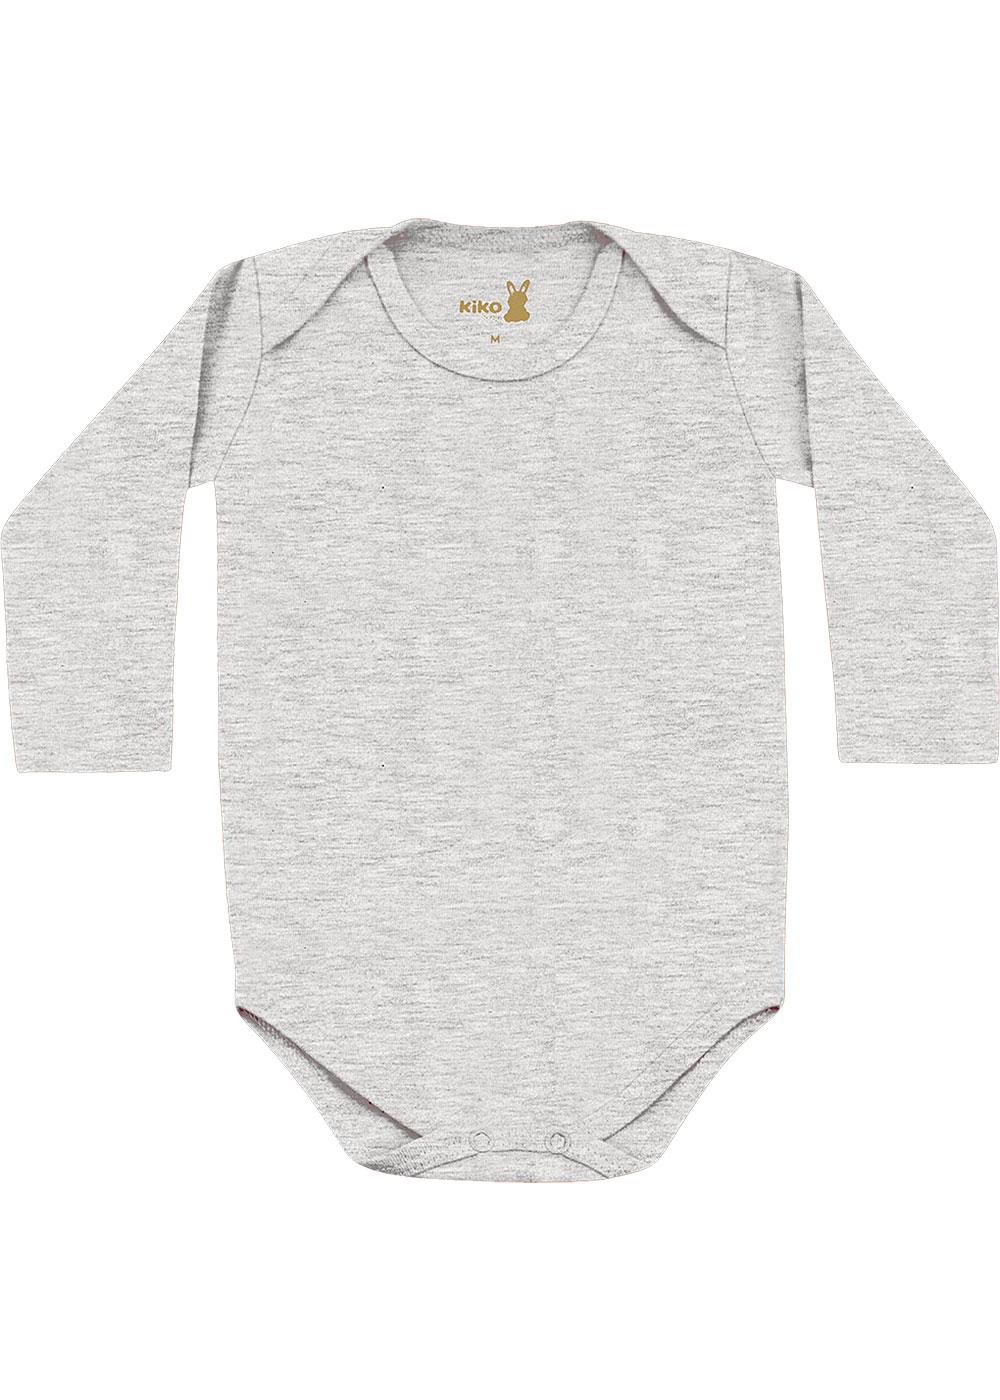 Body Infantil Unissex Inverno Kit 3 Cinza Lisos - Kiko e Kika